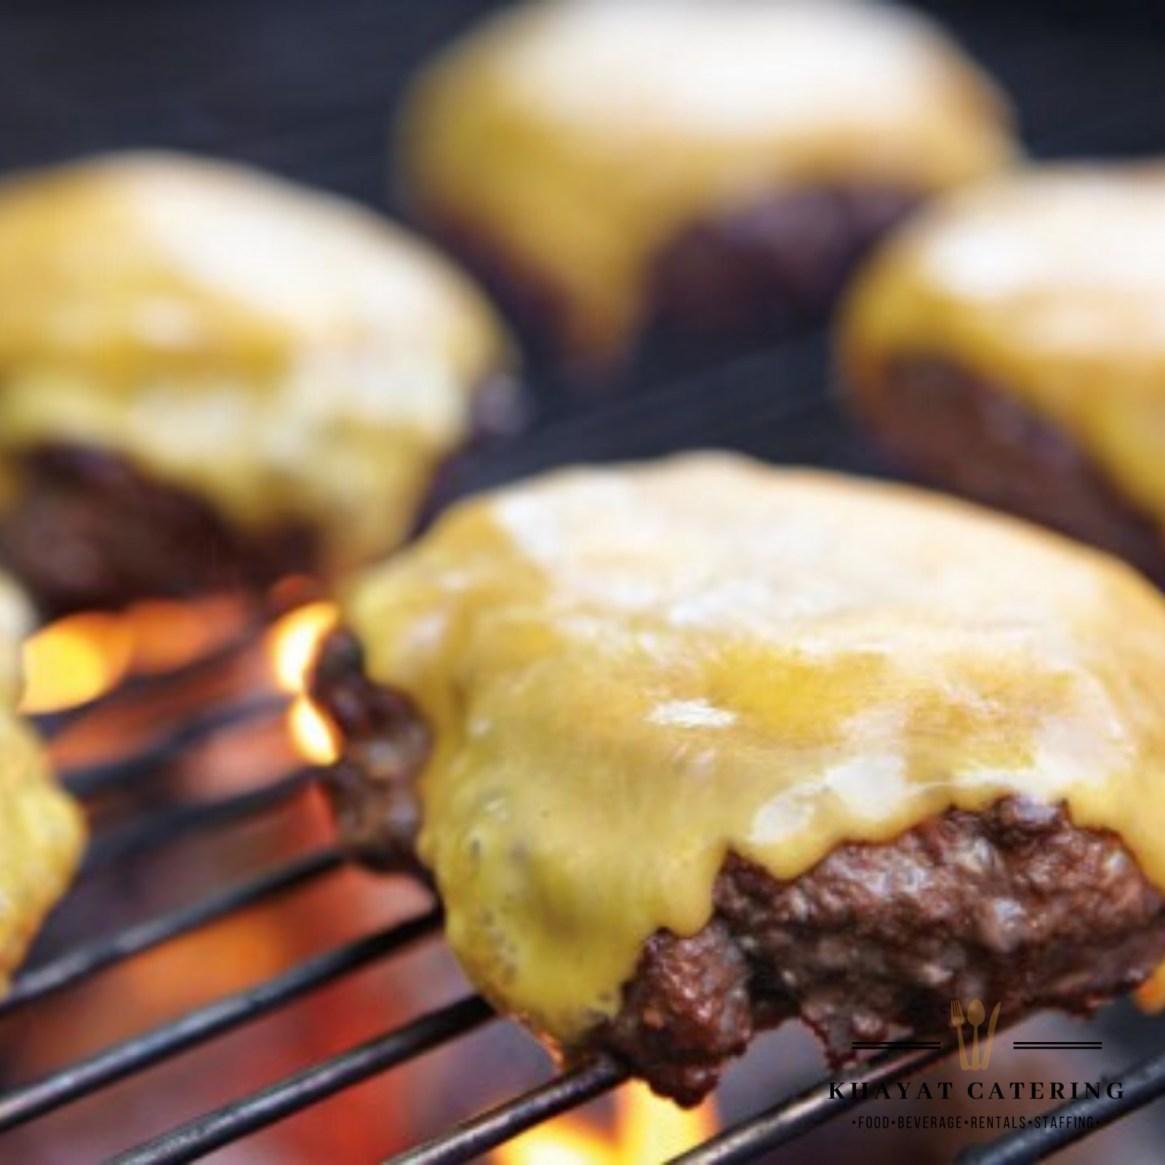 Khayat Catering cheeseburger